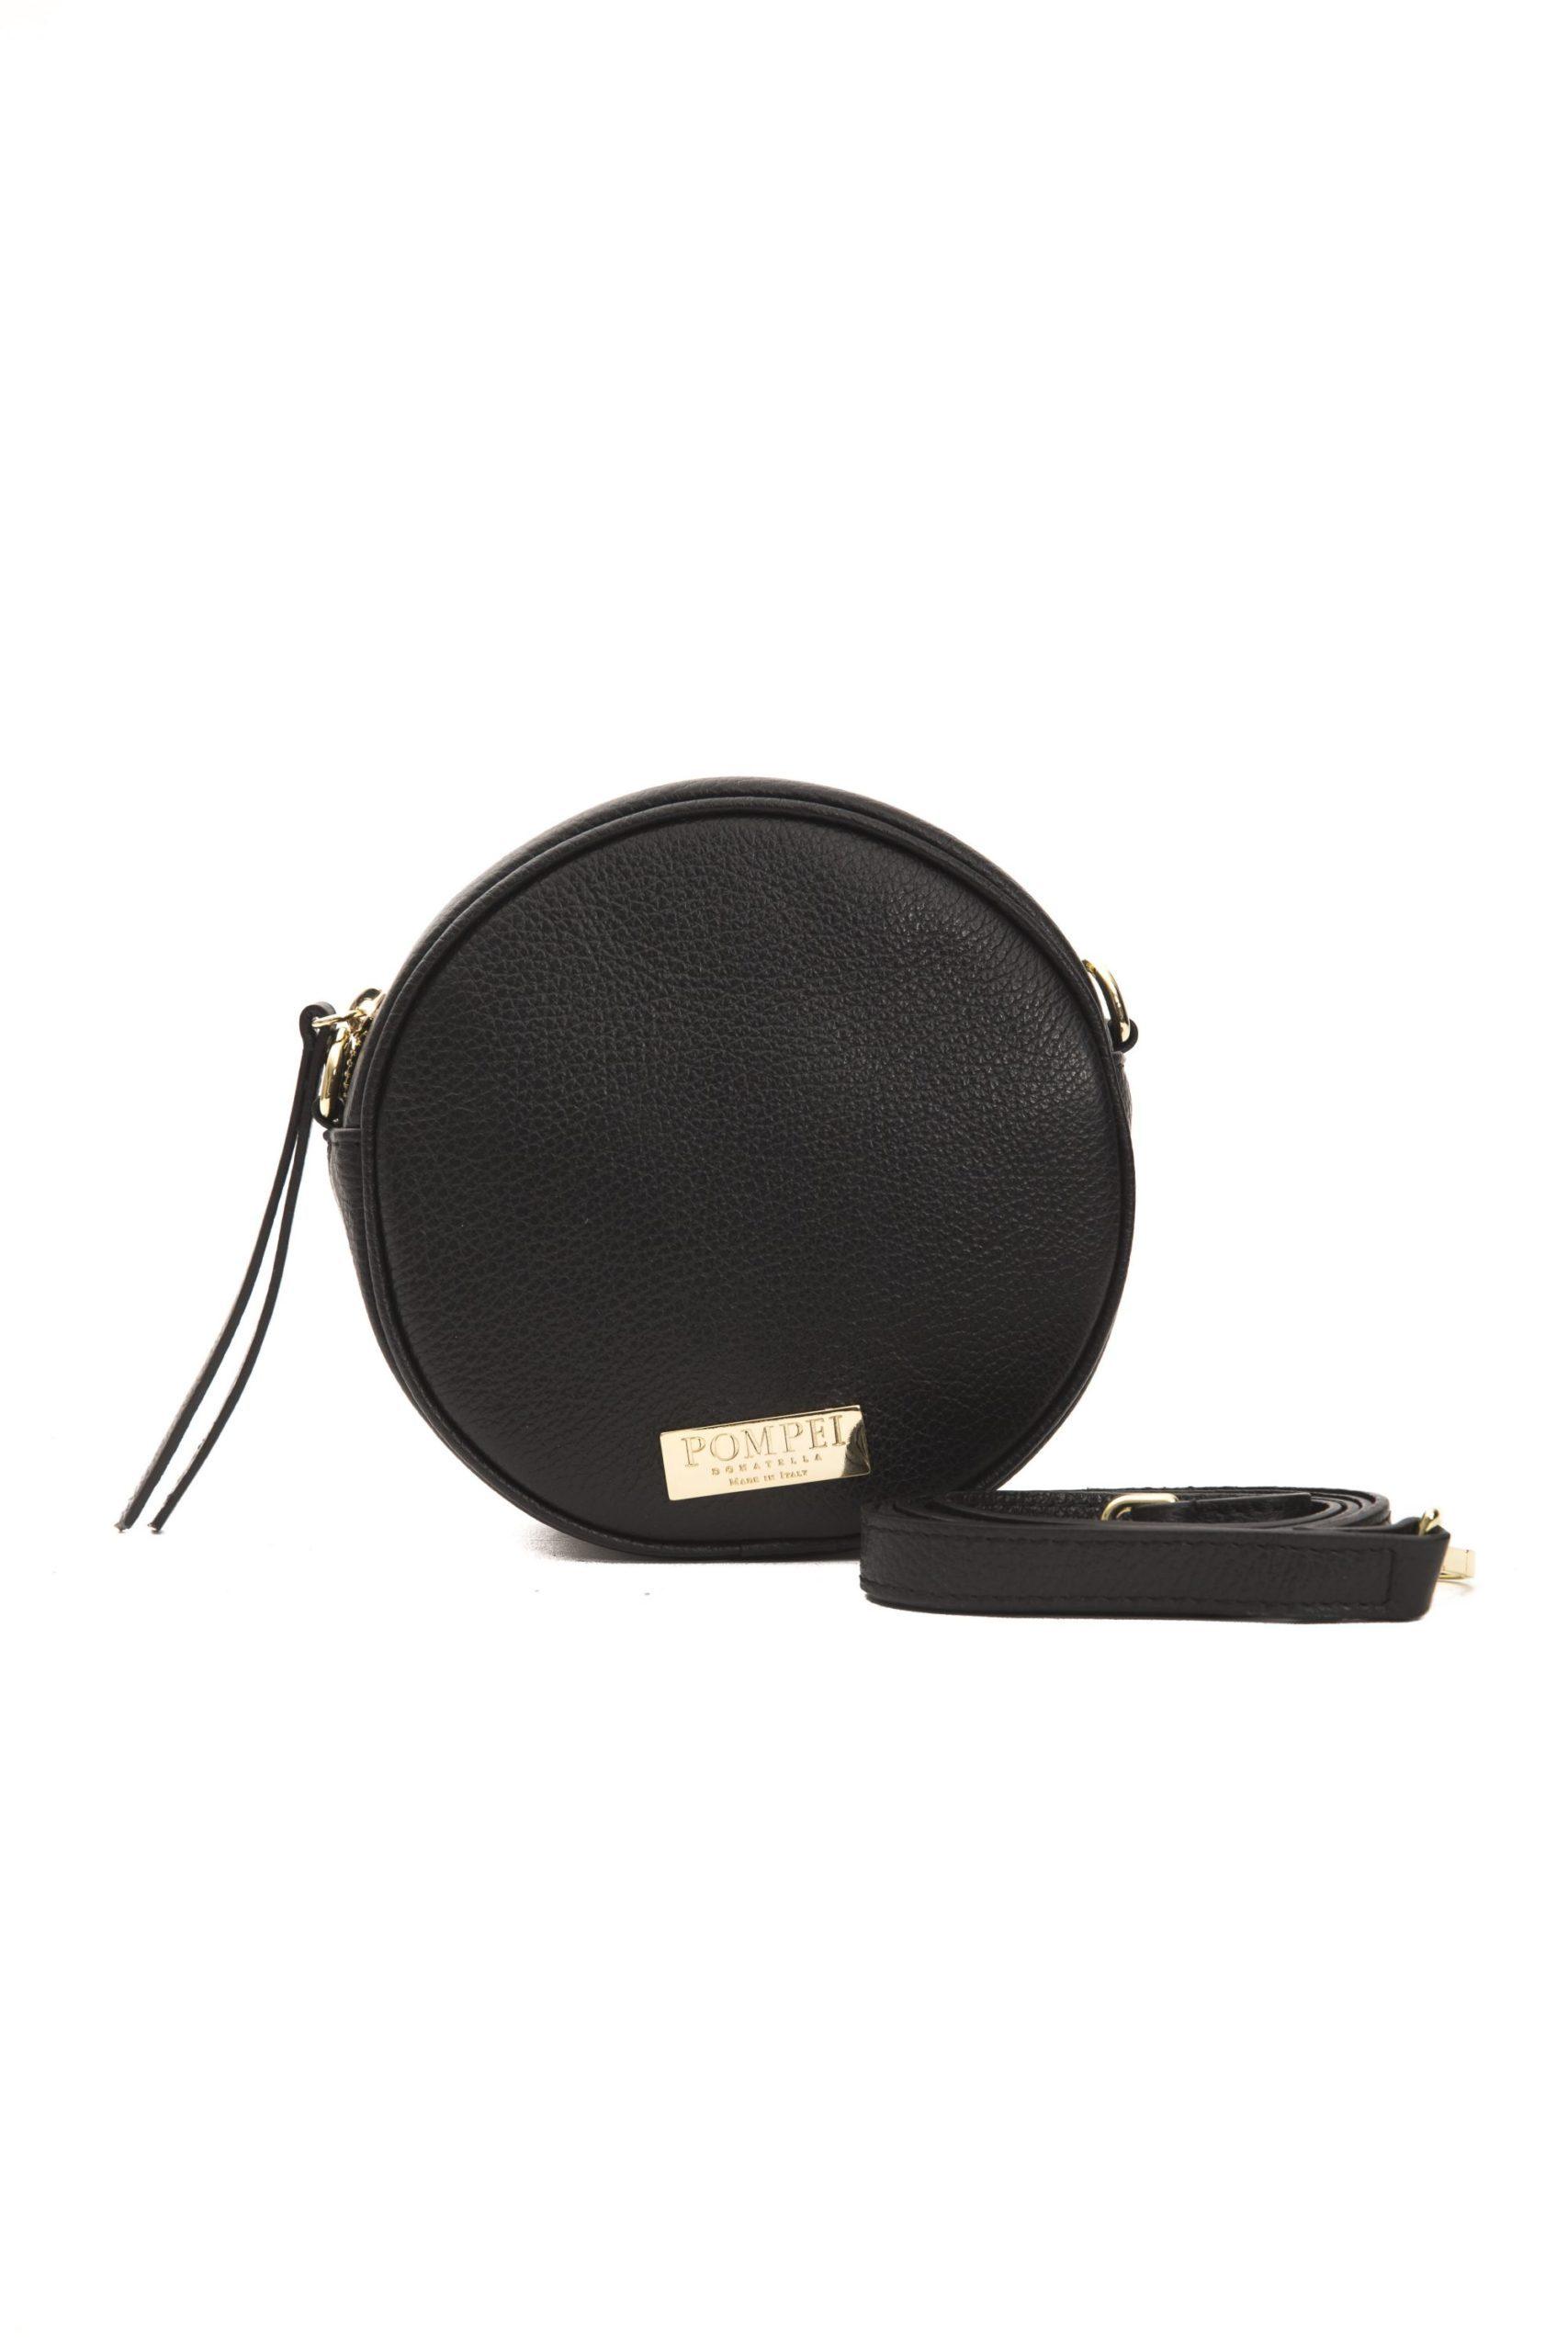 Pompei Donatella Women's Nero Crossbody Bag Black PO1004949